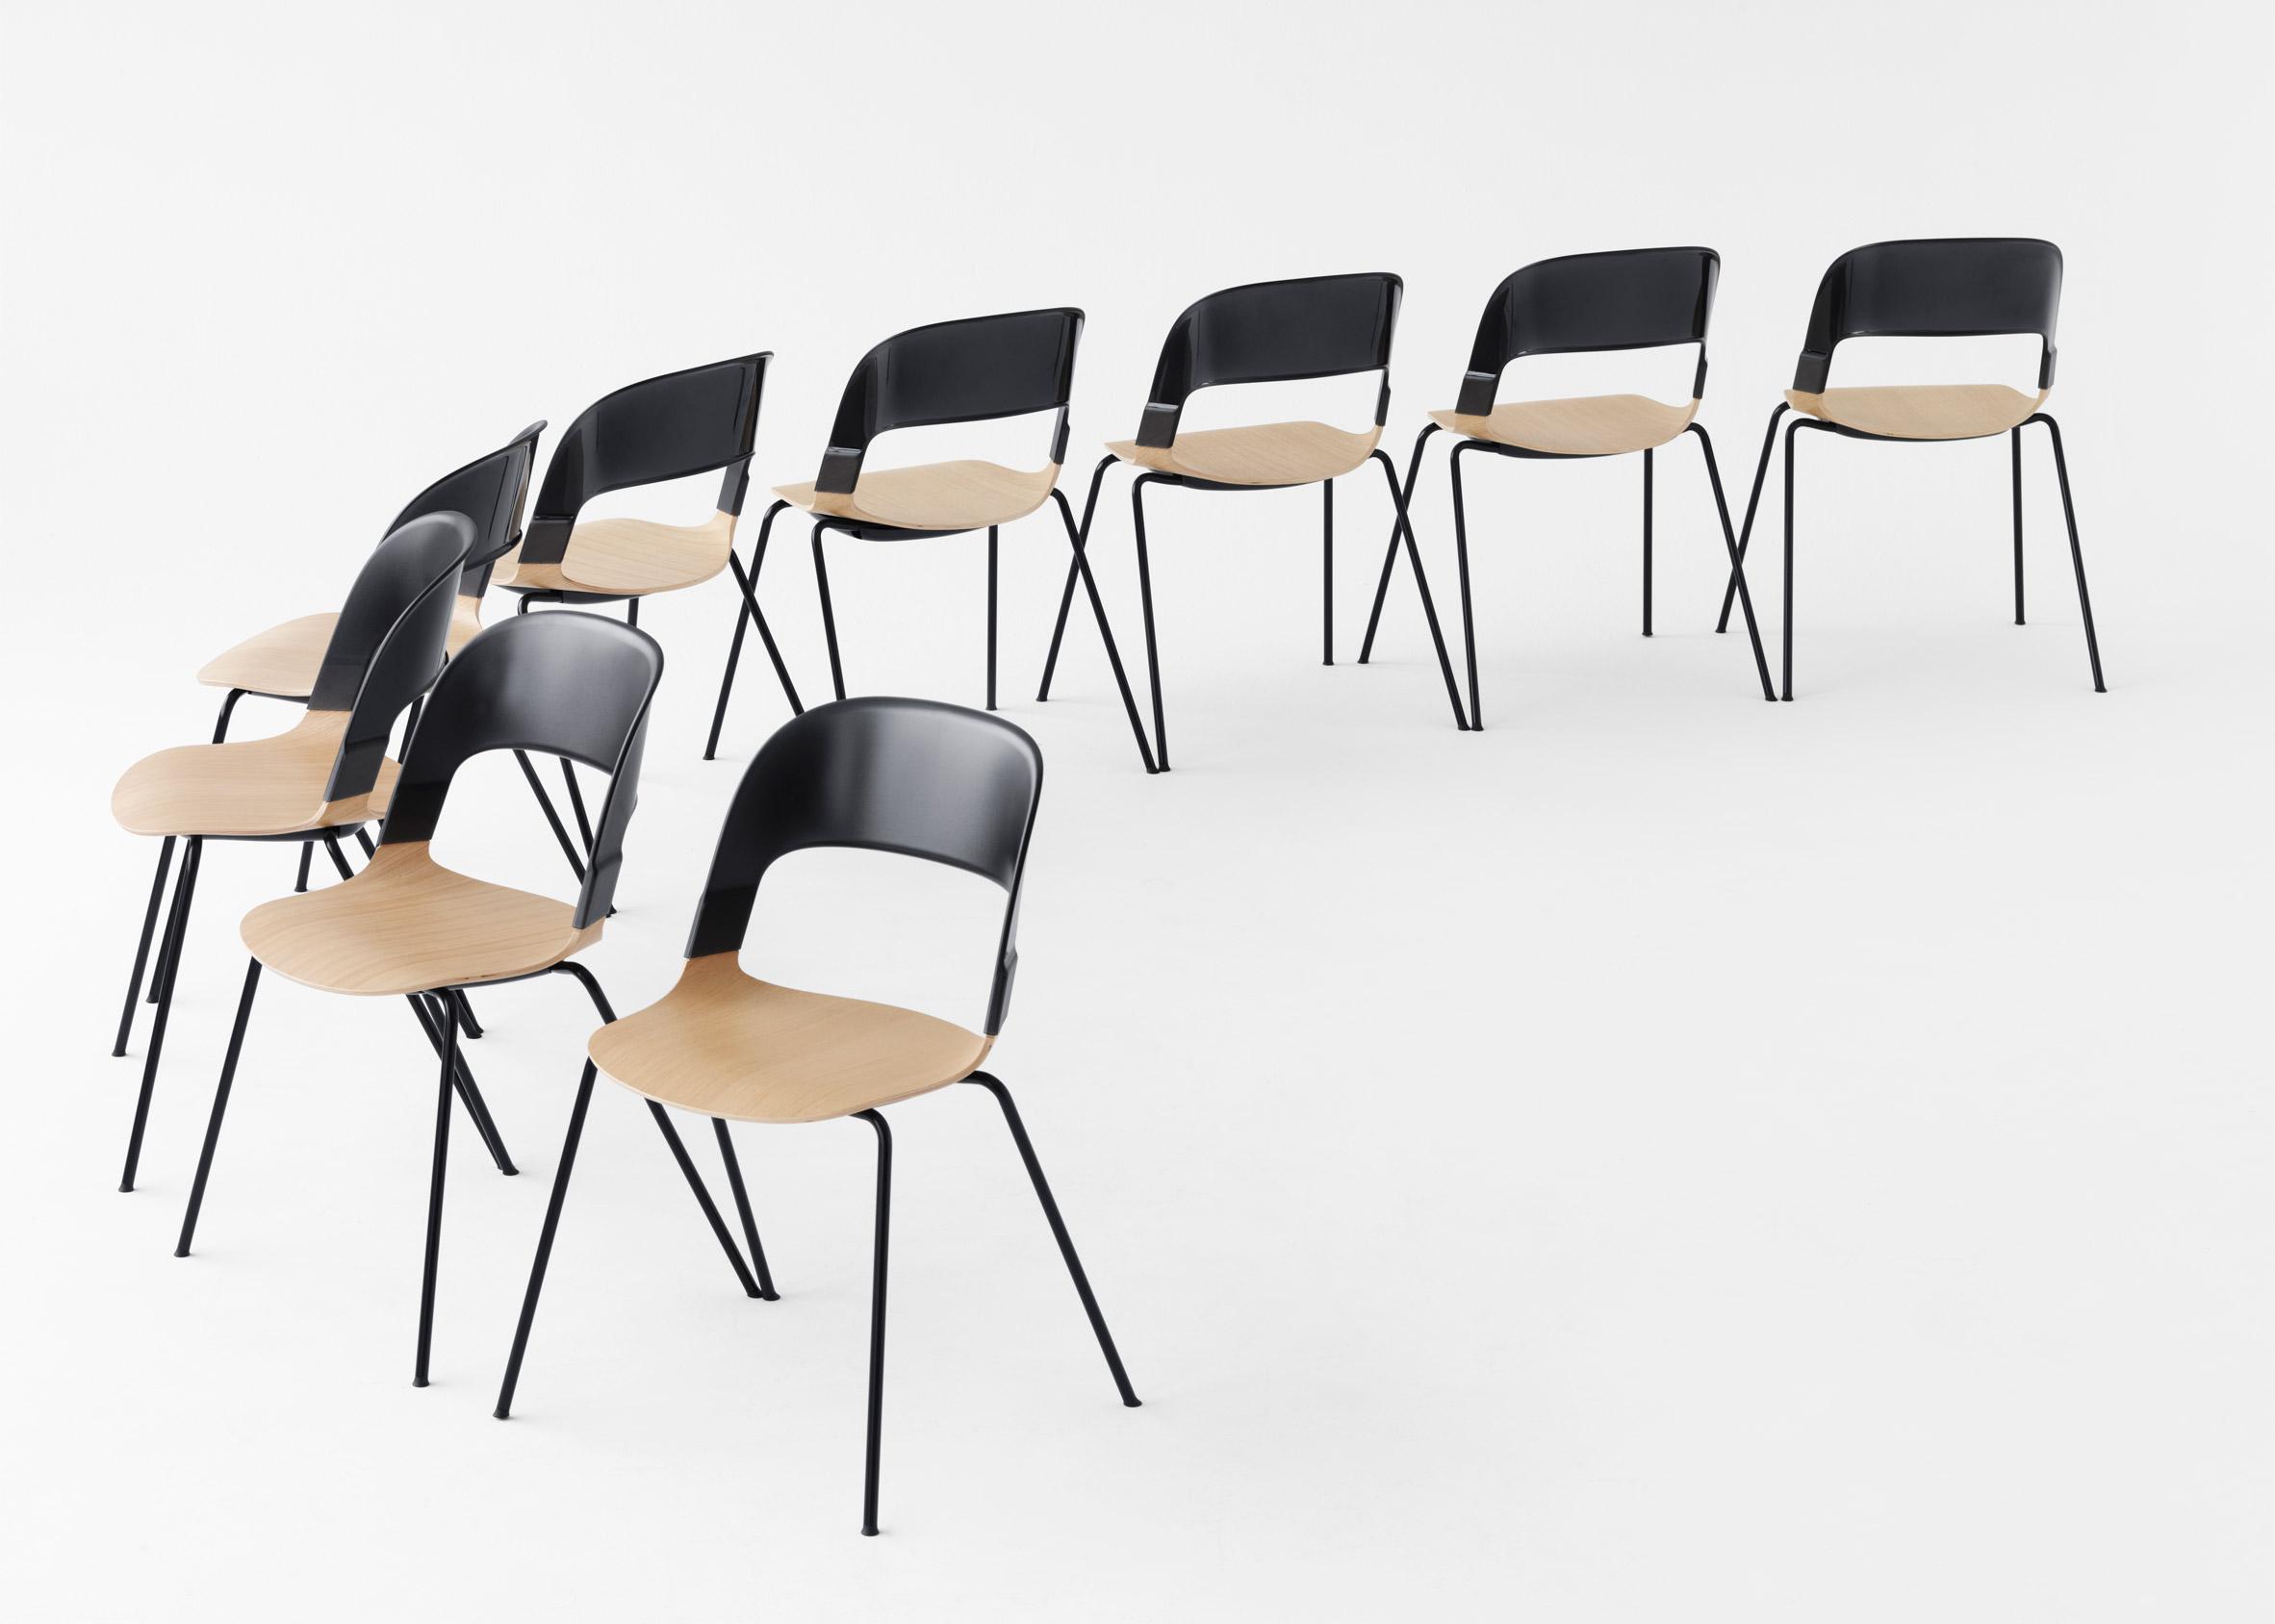 Pair Chair by Benjamin Hubert for Fritz Hansen